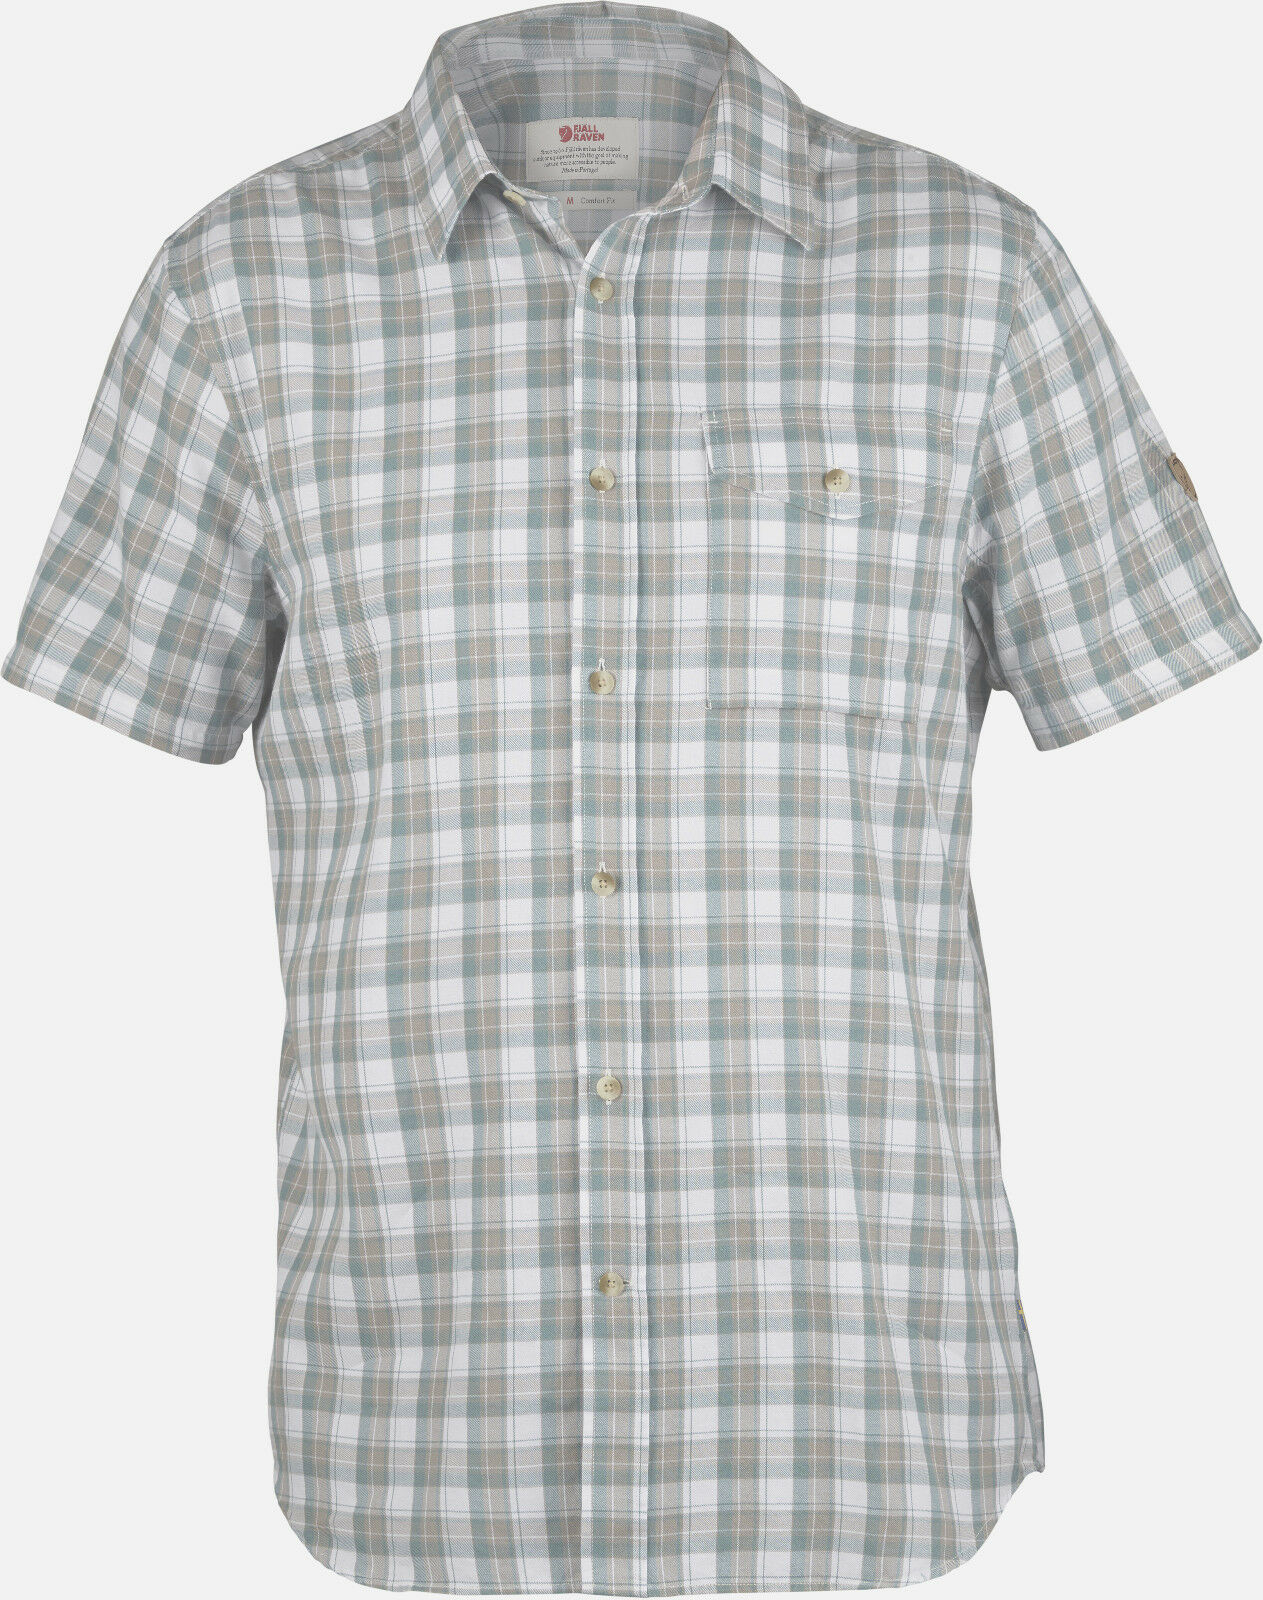 Fjällräven Singi Shirt Ss 82446 Fog Messieurs Haut de plein airhemd Wanderhemd